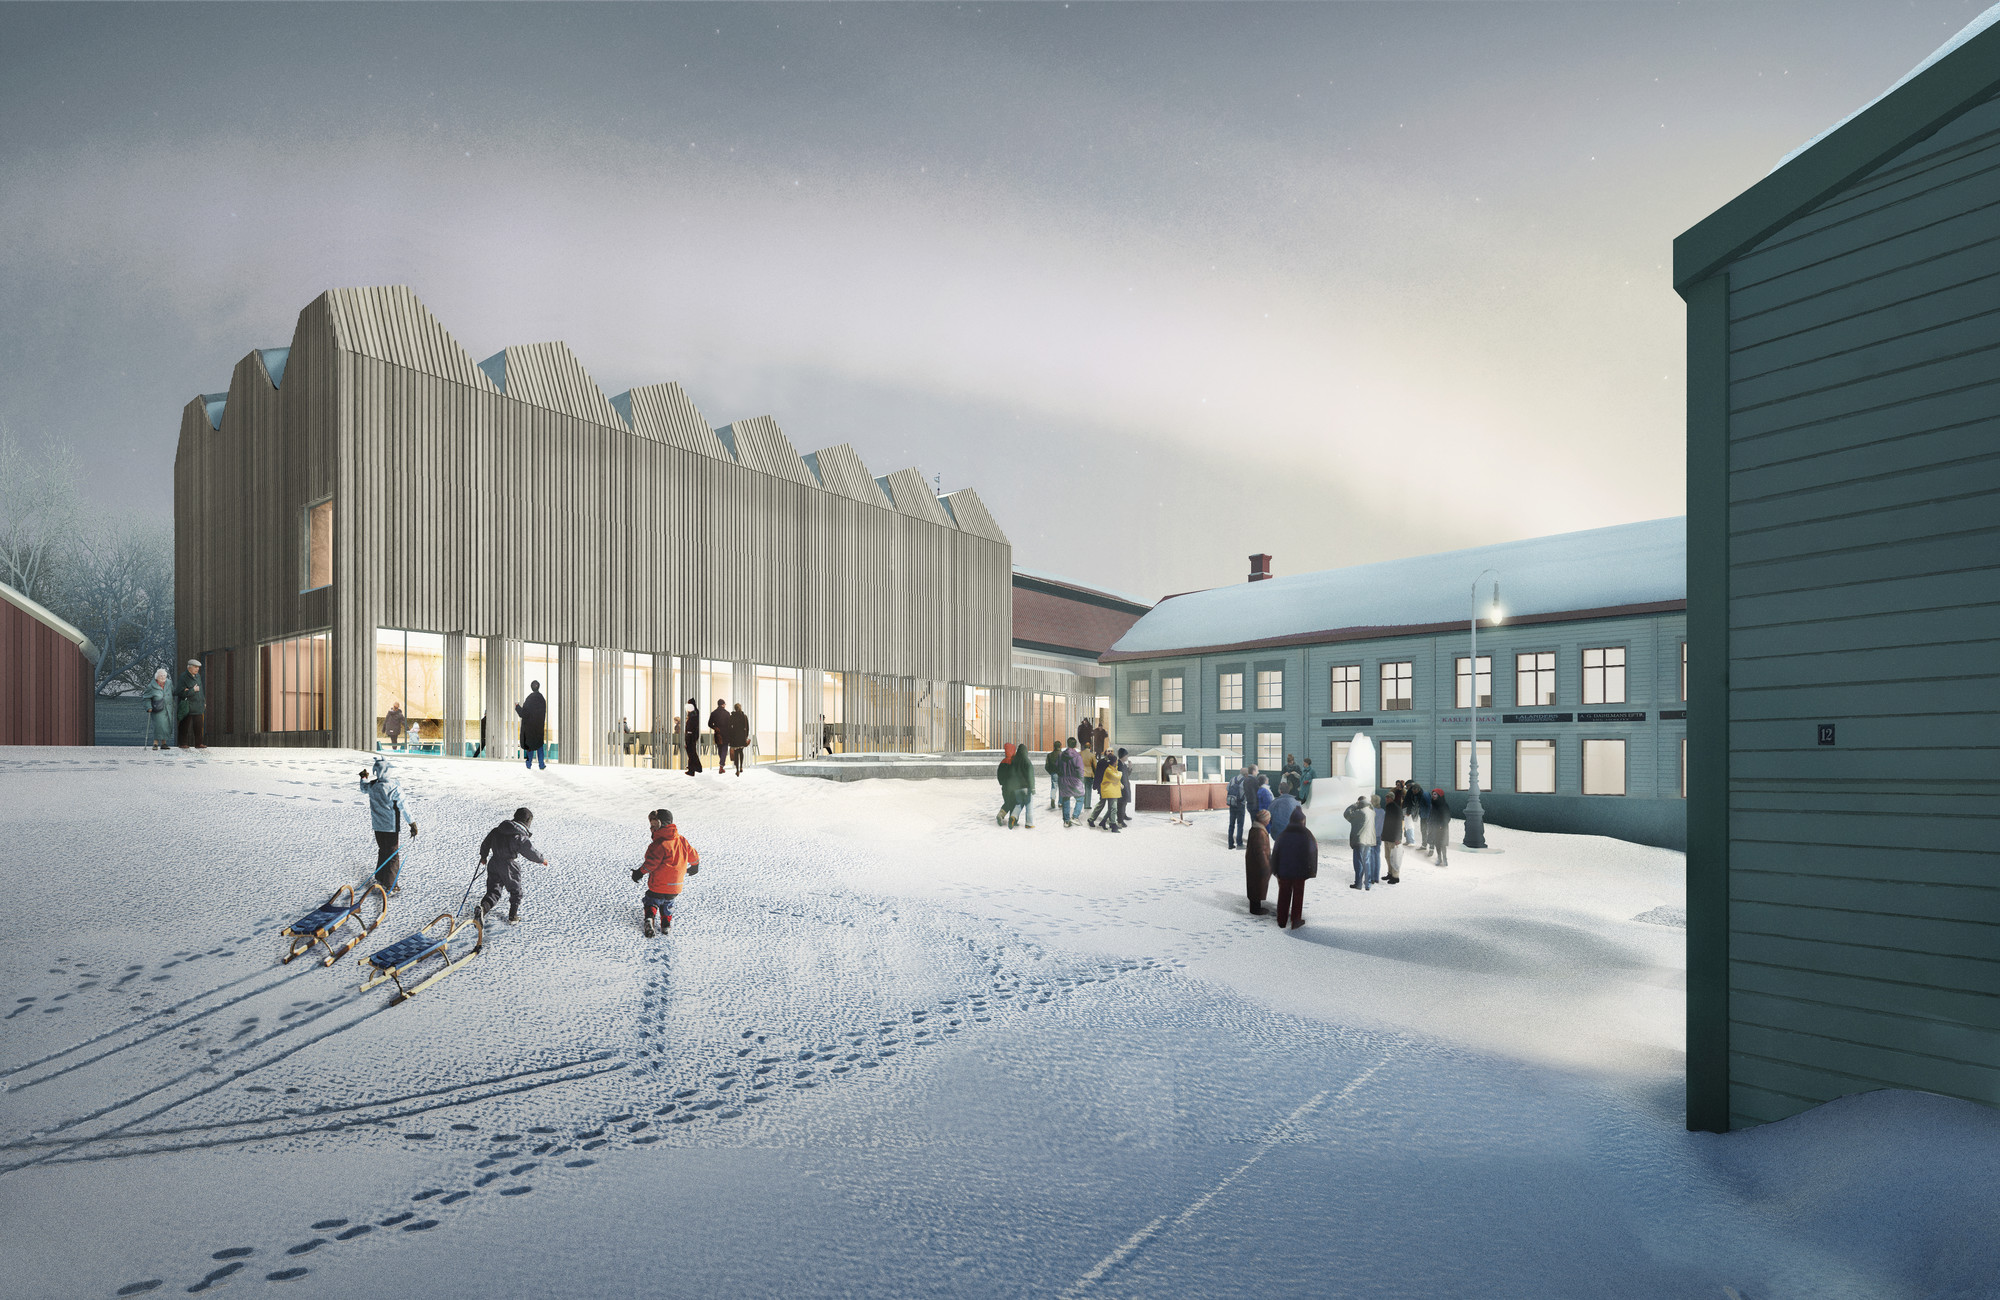 Henning Larsen vence concurso para projetar a nova sede do Museu Nacional da Suécia, Pátio. Imagem © Henning Larsen Architects